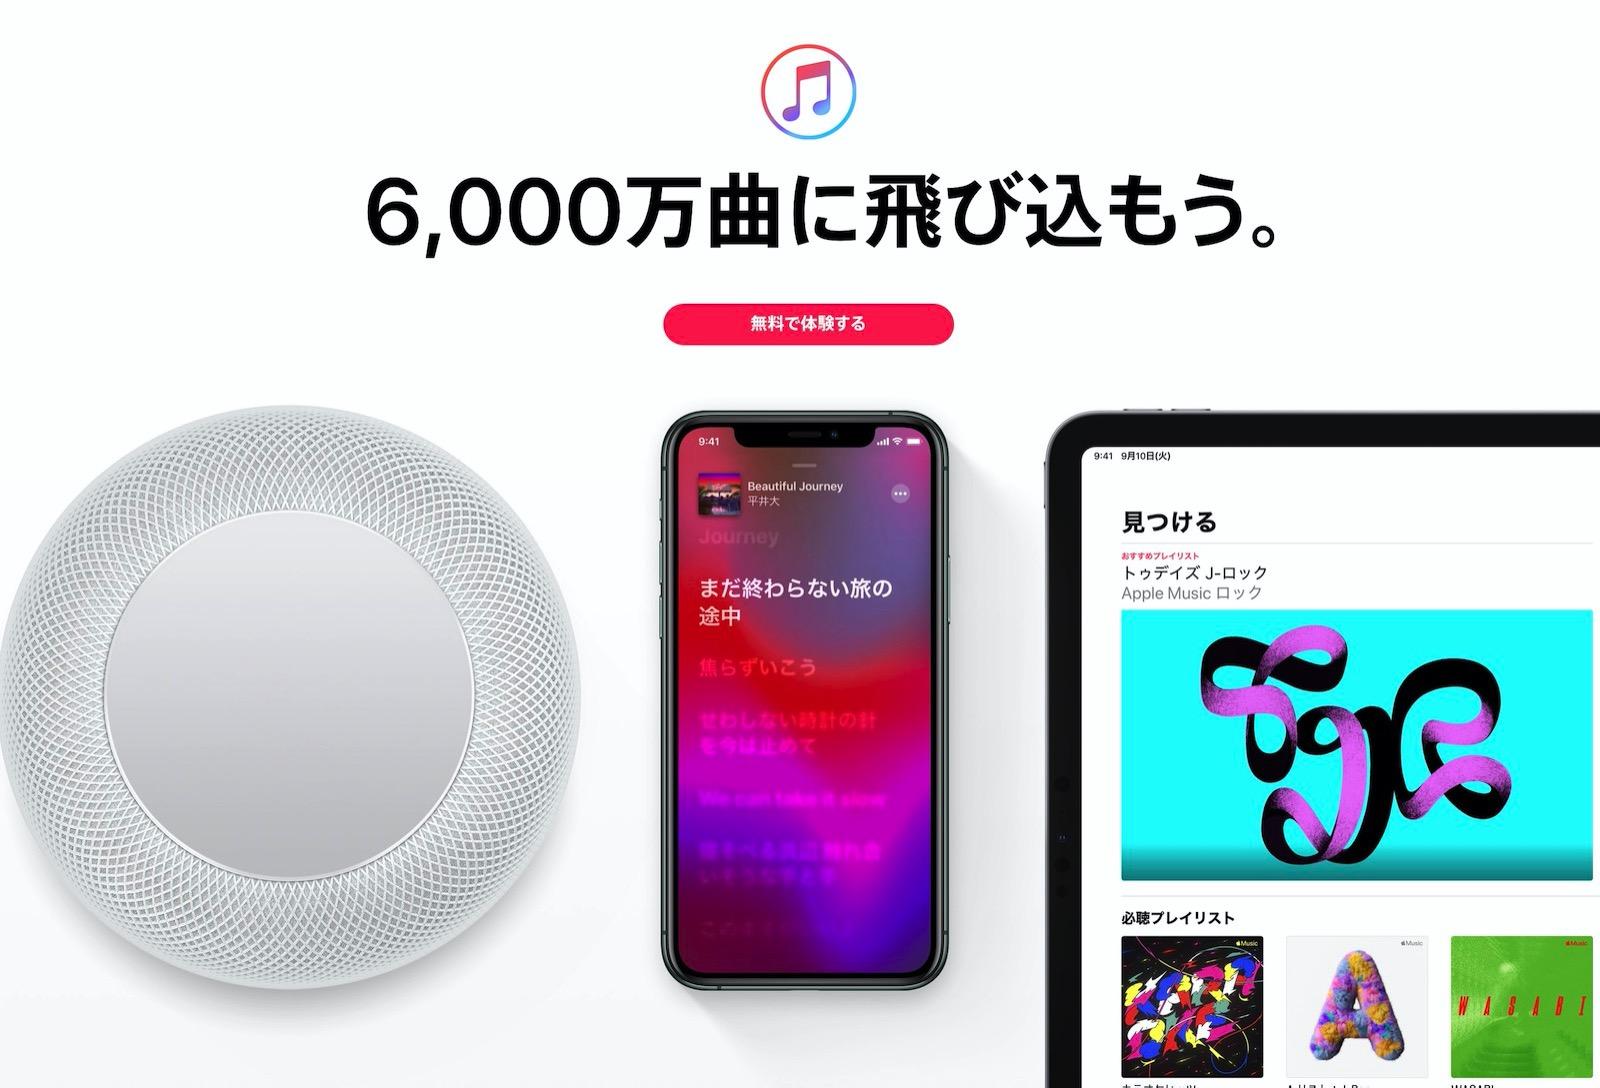 Apple music 60million songs